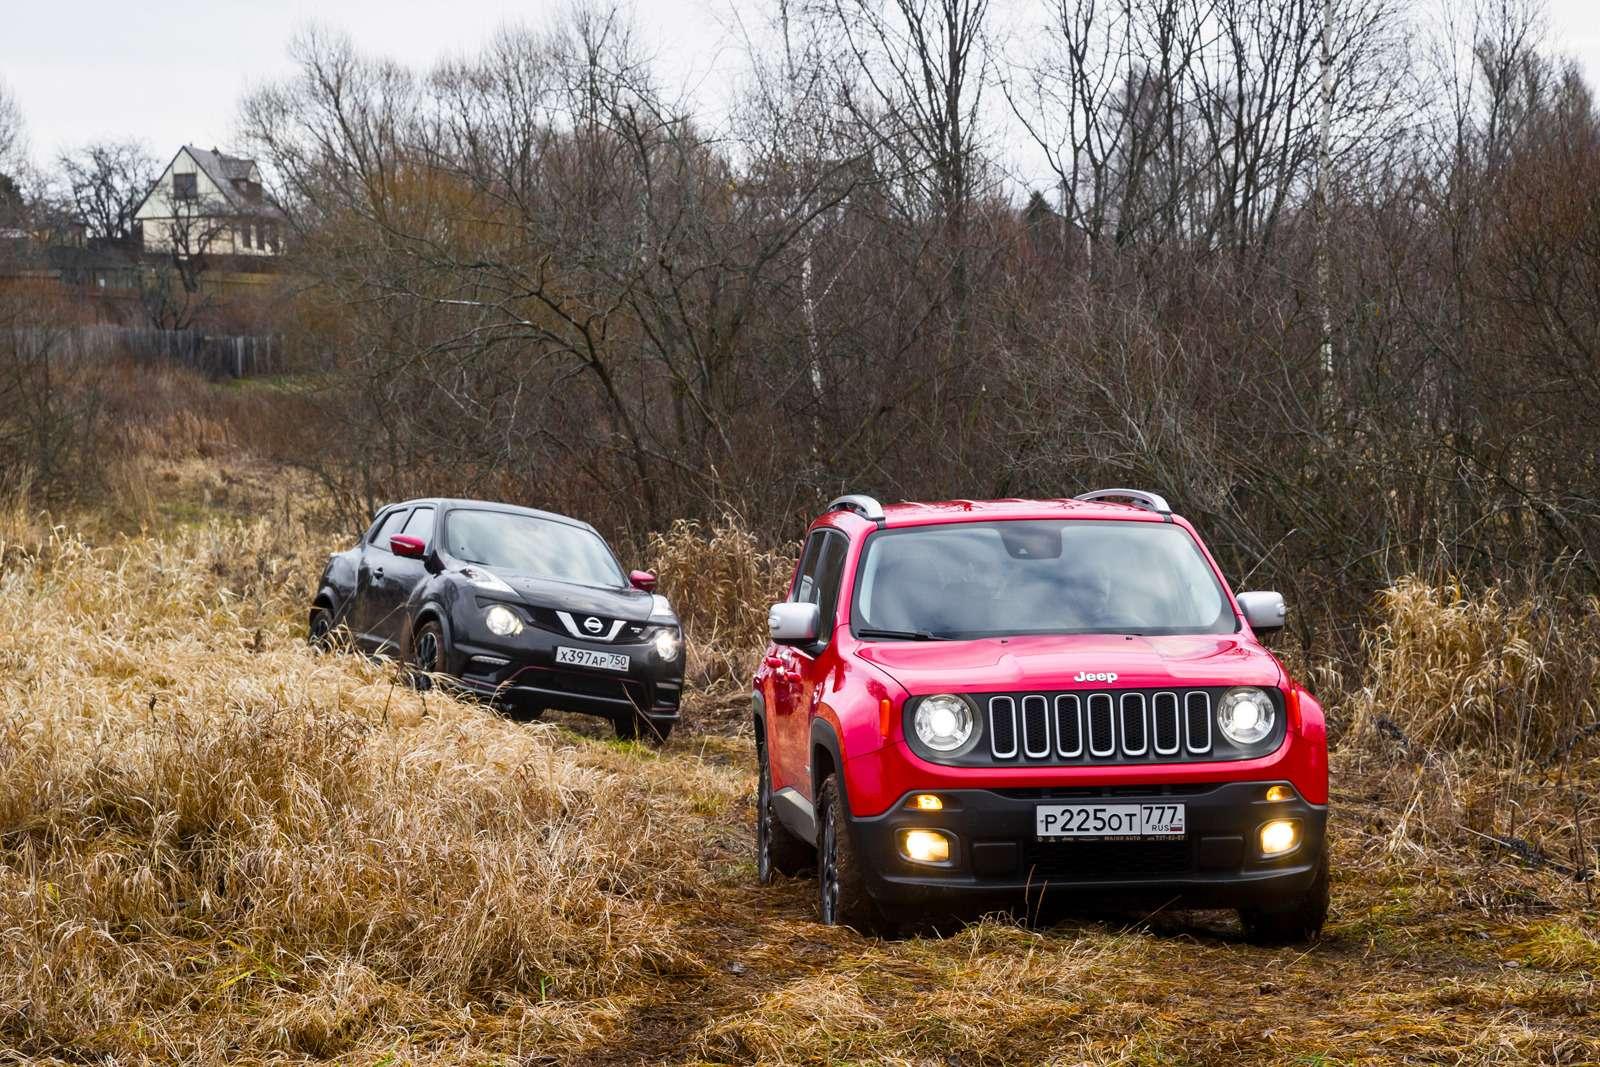 02-Jeep-&—Juke_zr-02_16